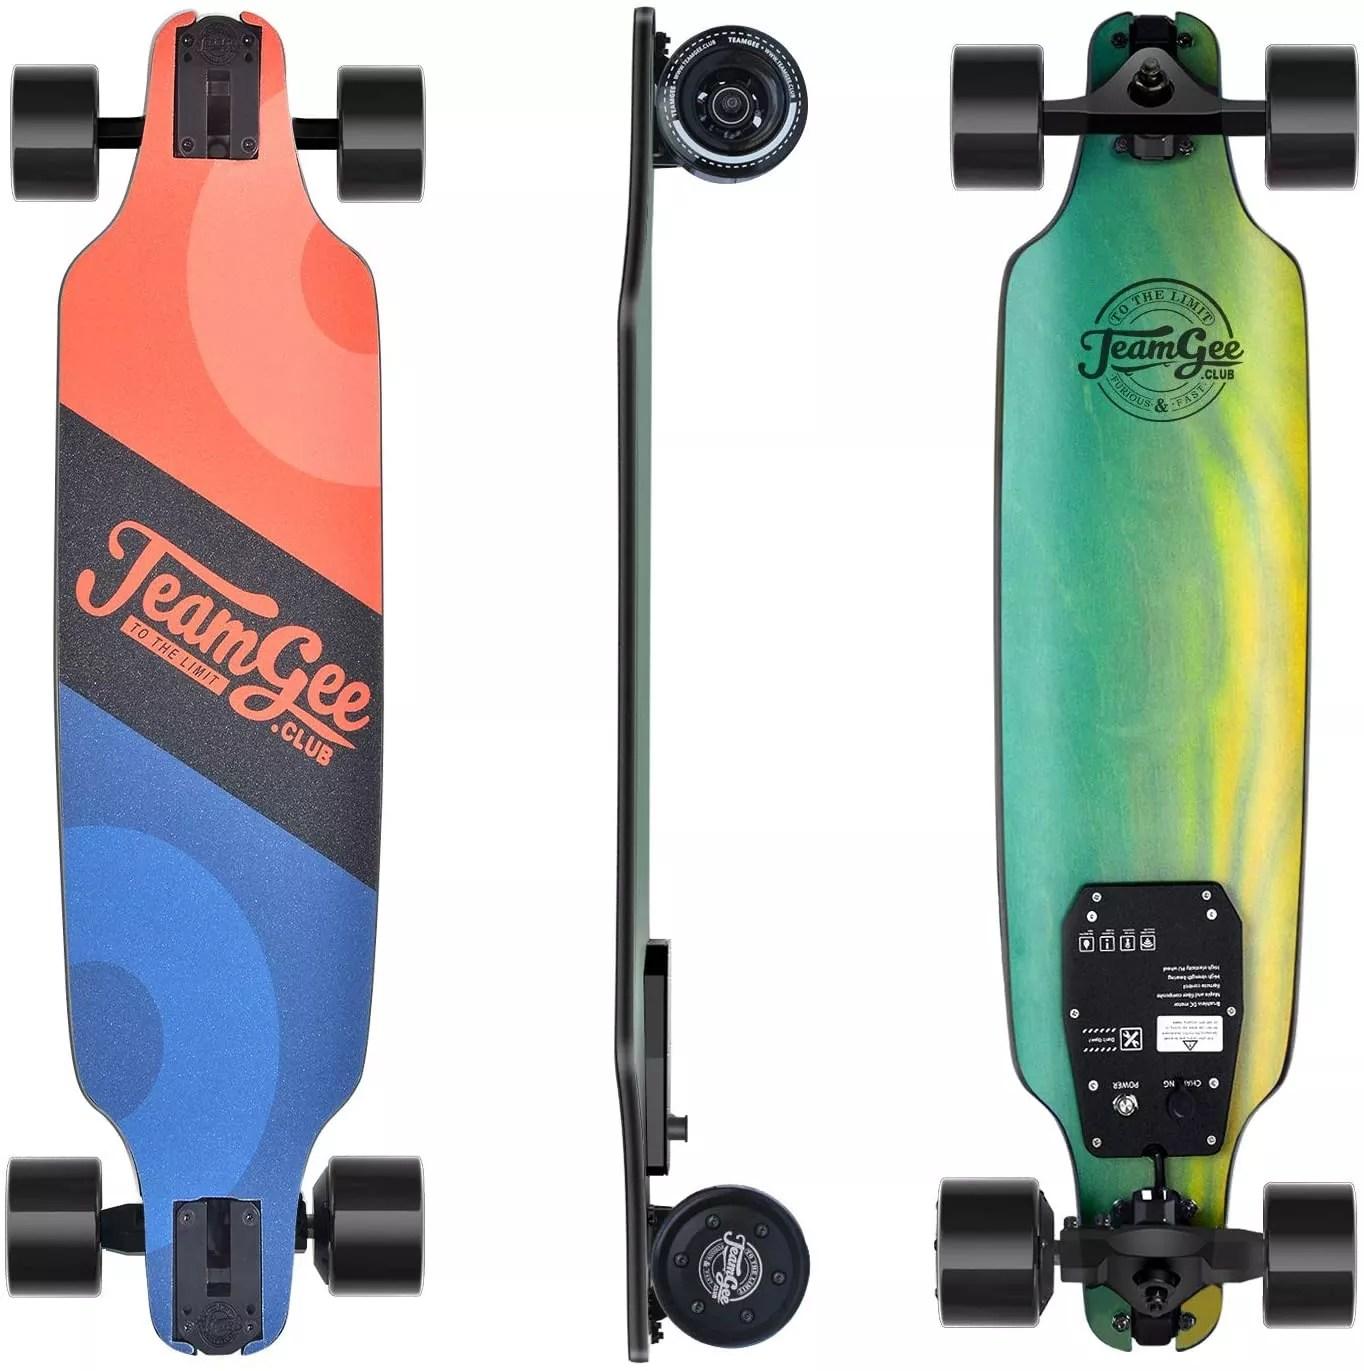 "Teamgee H8 31"" Electric Skateboard"